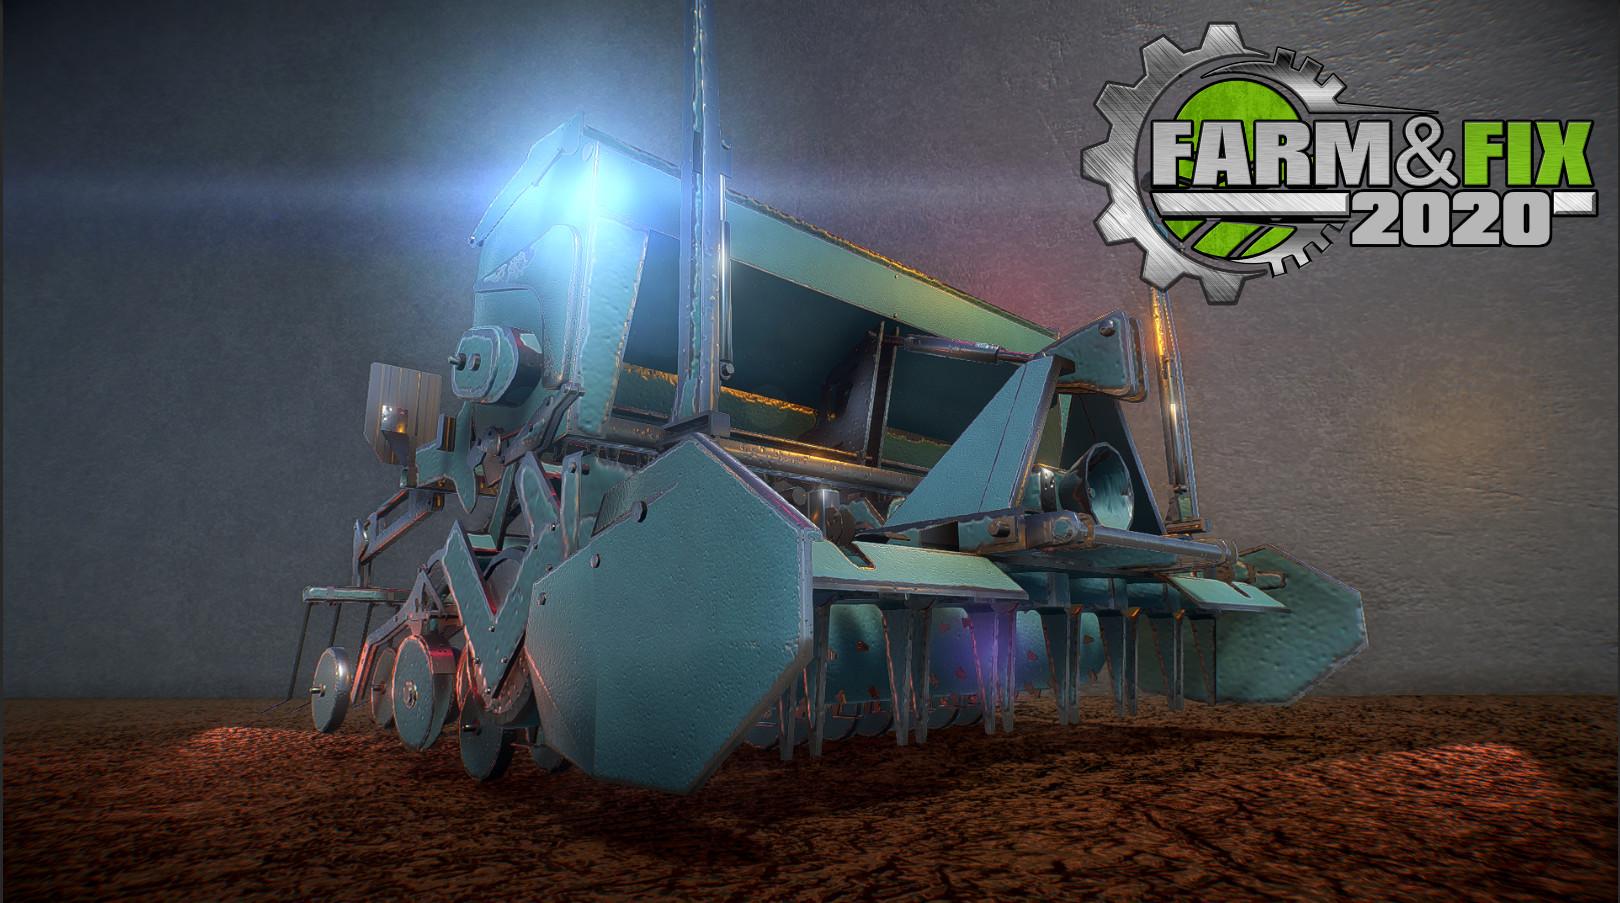 Farming simulator 2020 pc